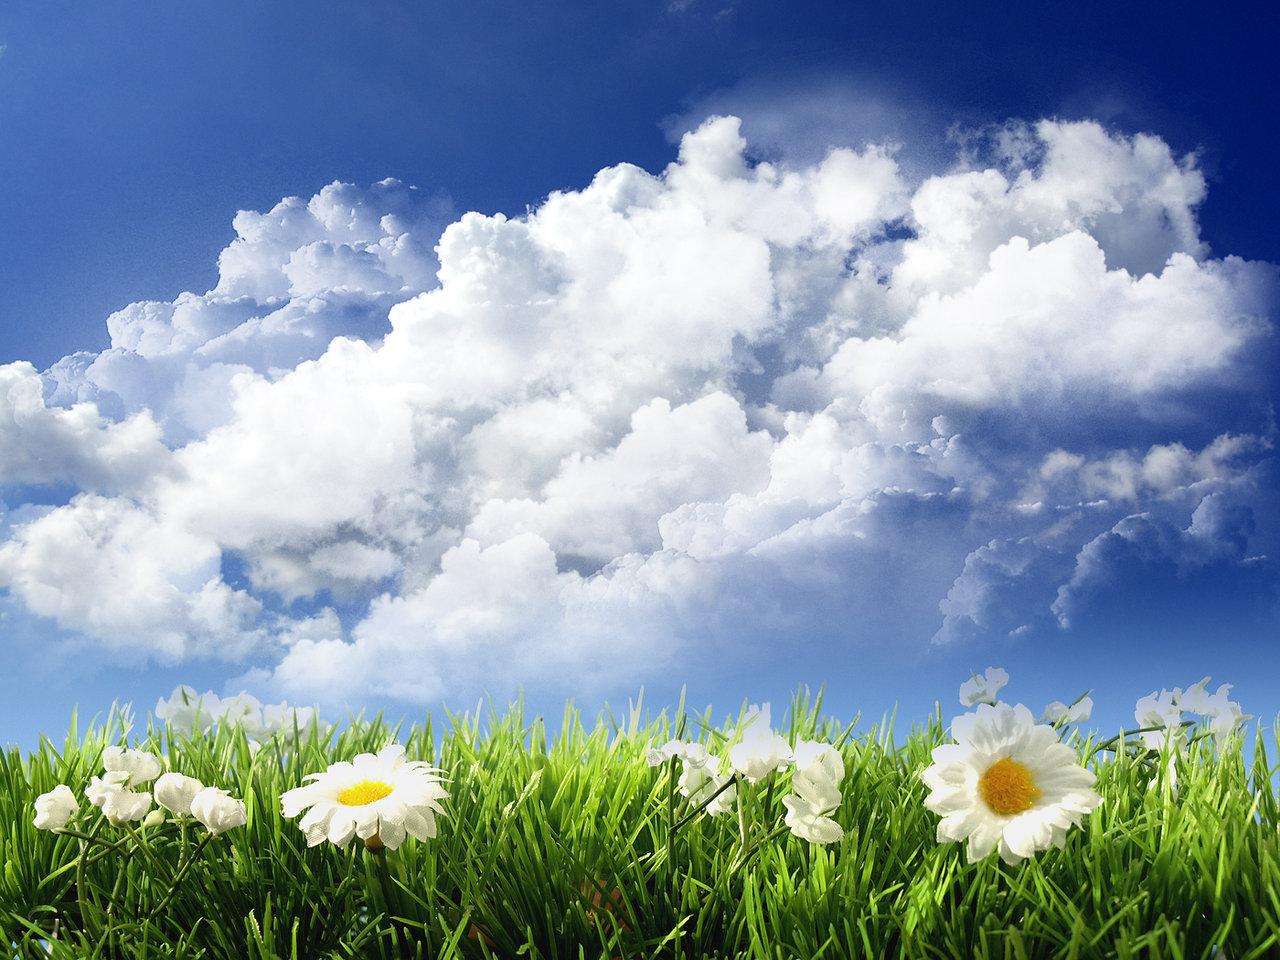 http://4.bp.blogspot.com/-qI49AjX-_DI/TbLiWwFd5JI/AAAAAAAABcA/2_FPmV4y9Rs/s1600/sky-and-flowers.jpg